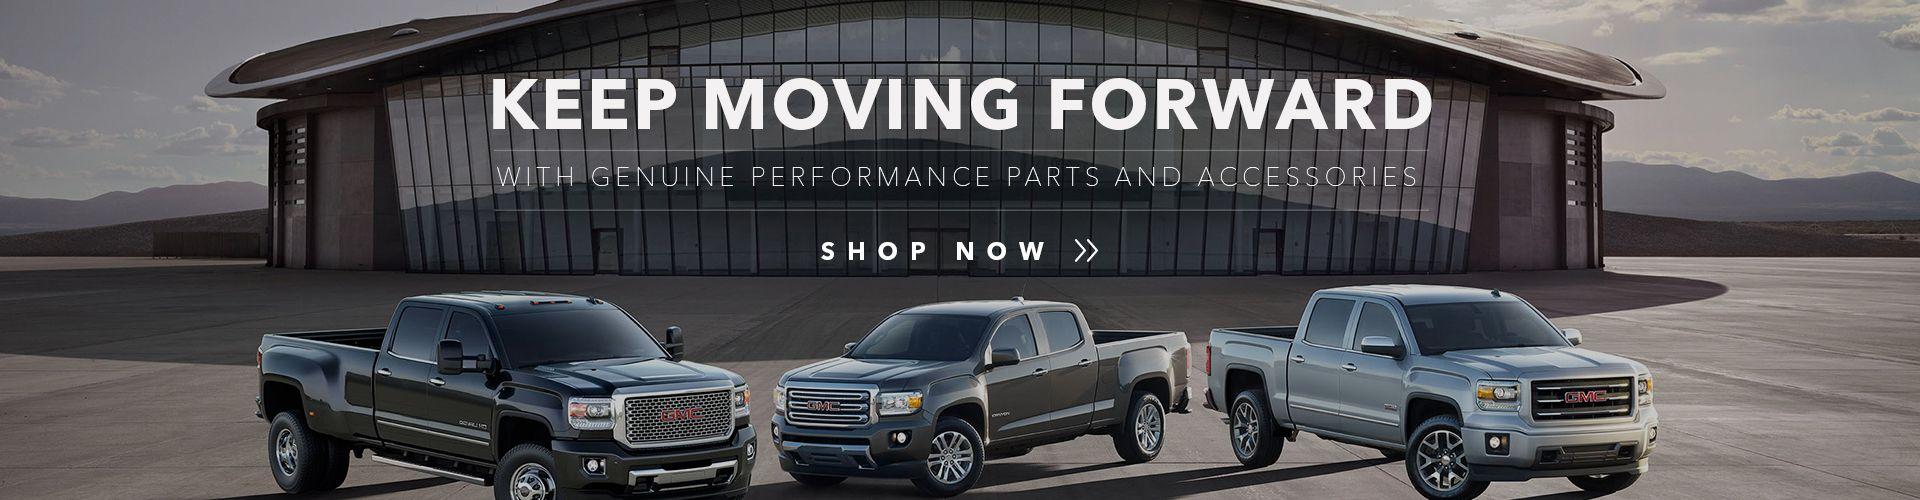 OEM GM Parts & Accessories